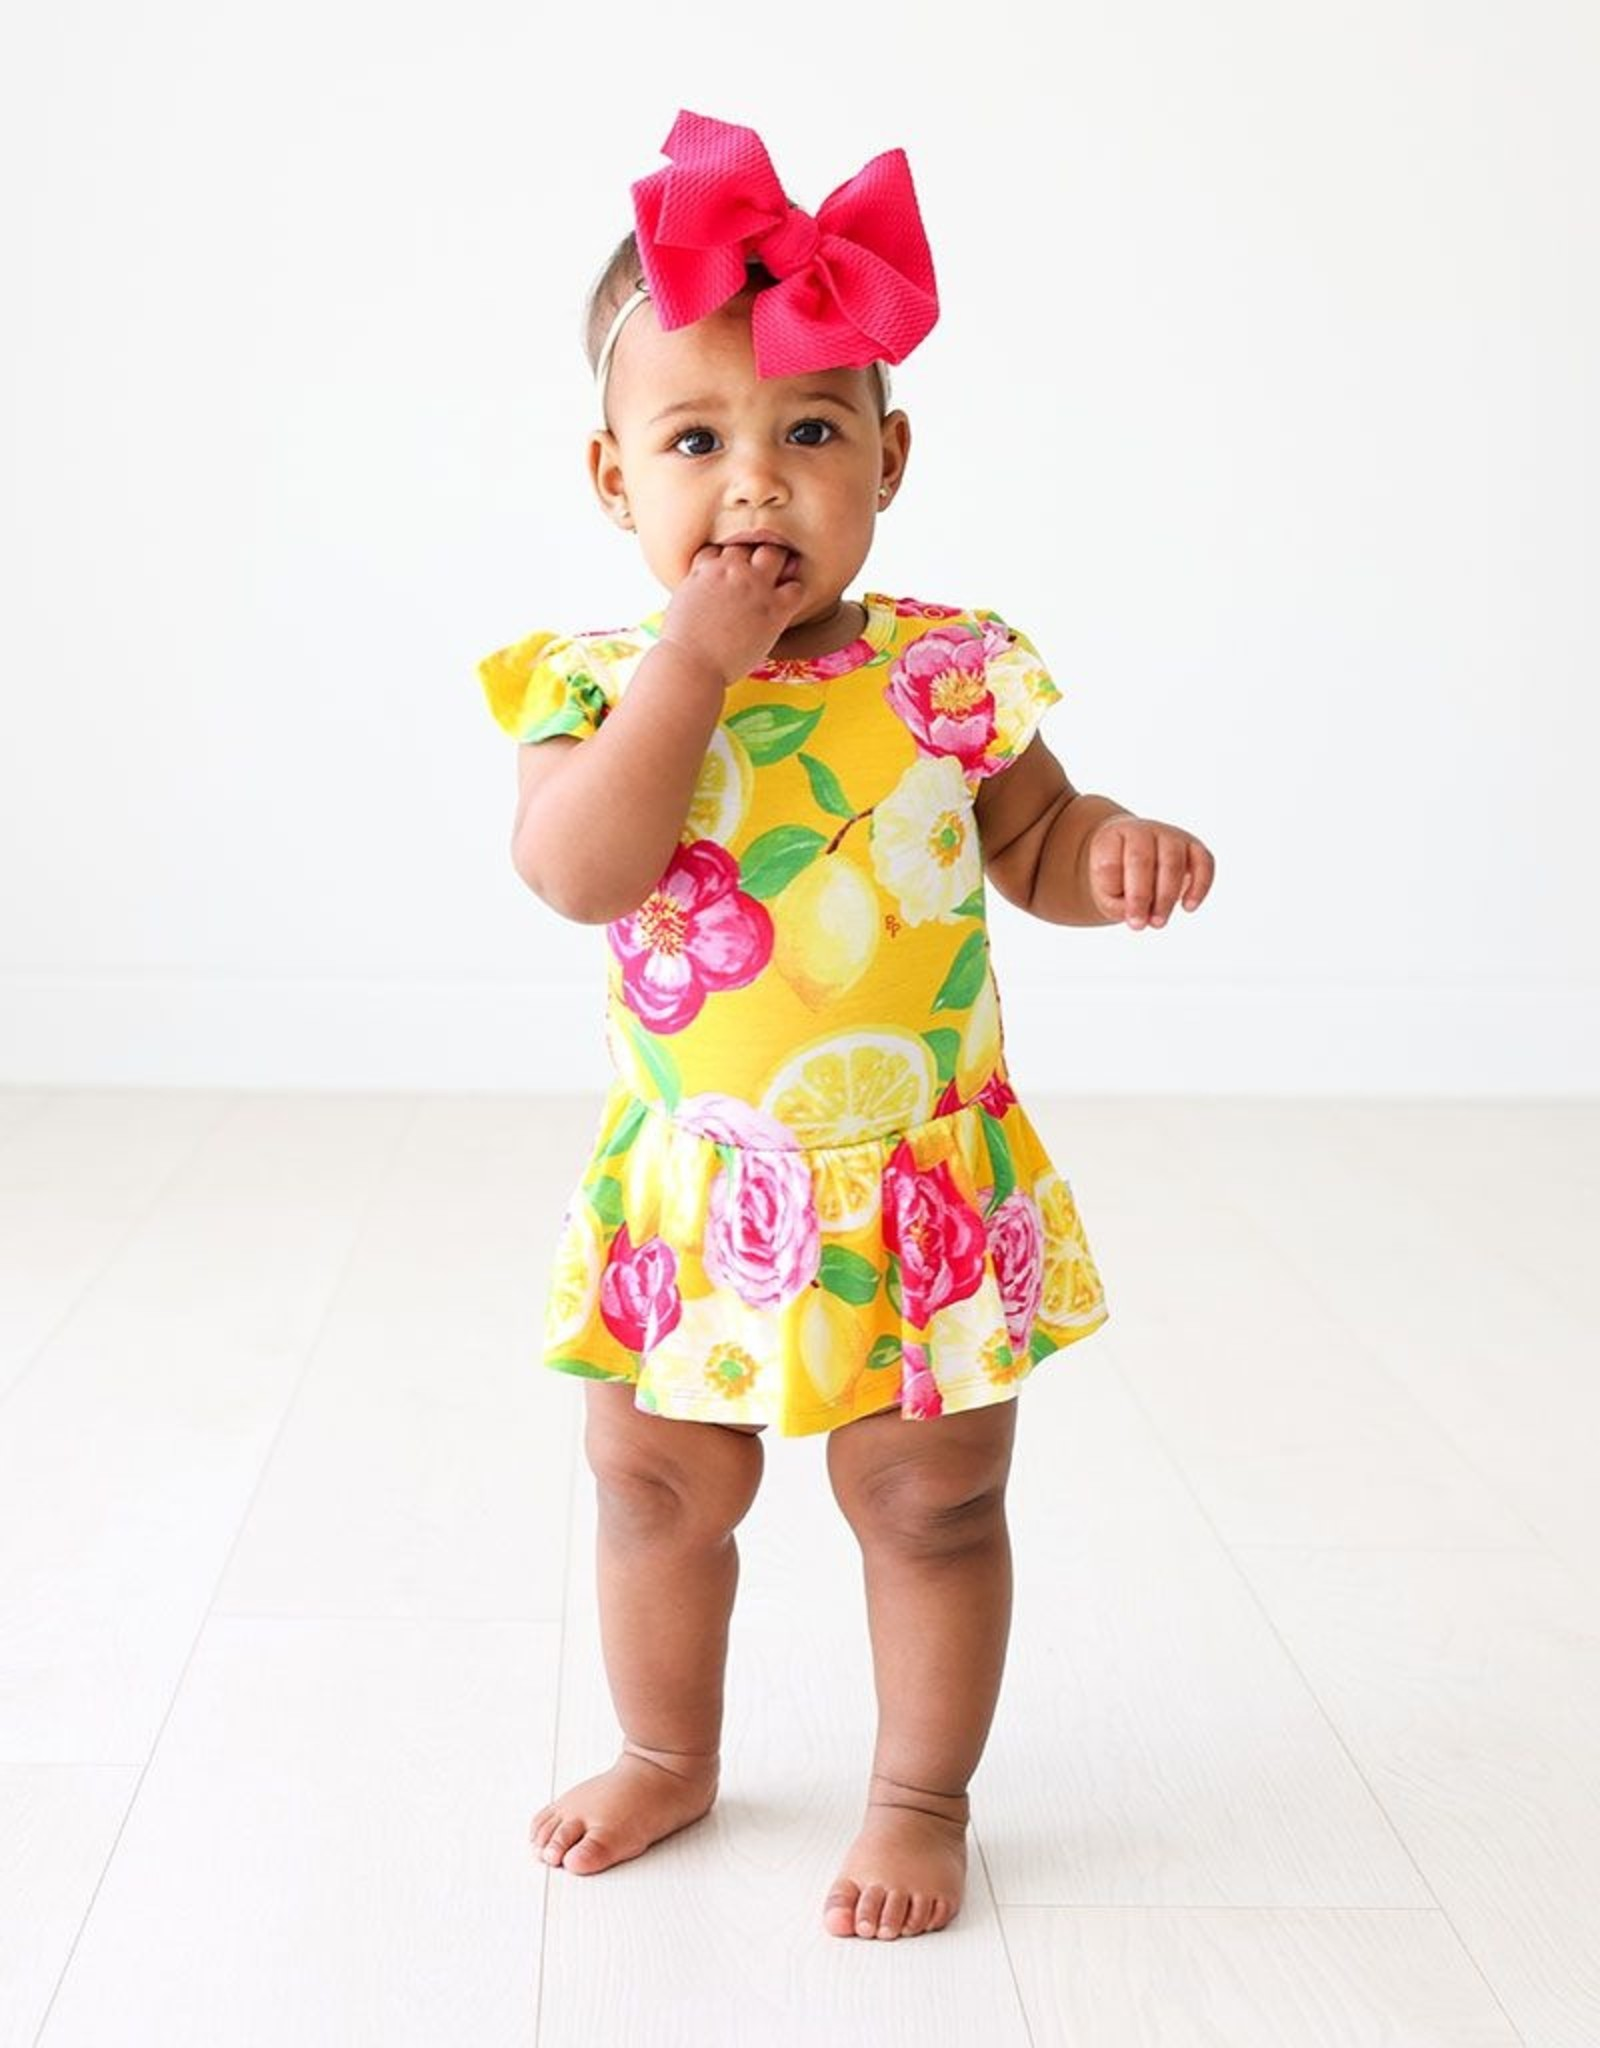 Posh Peanut Annika - Ruffled Capsleeve Basic Twirl Skirt Bodysuit